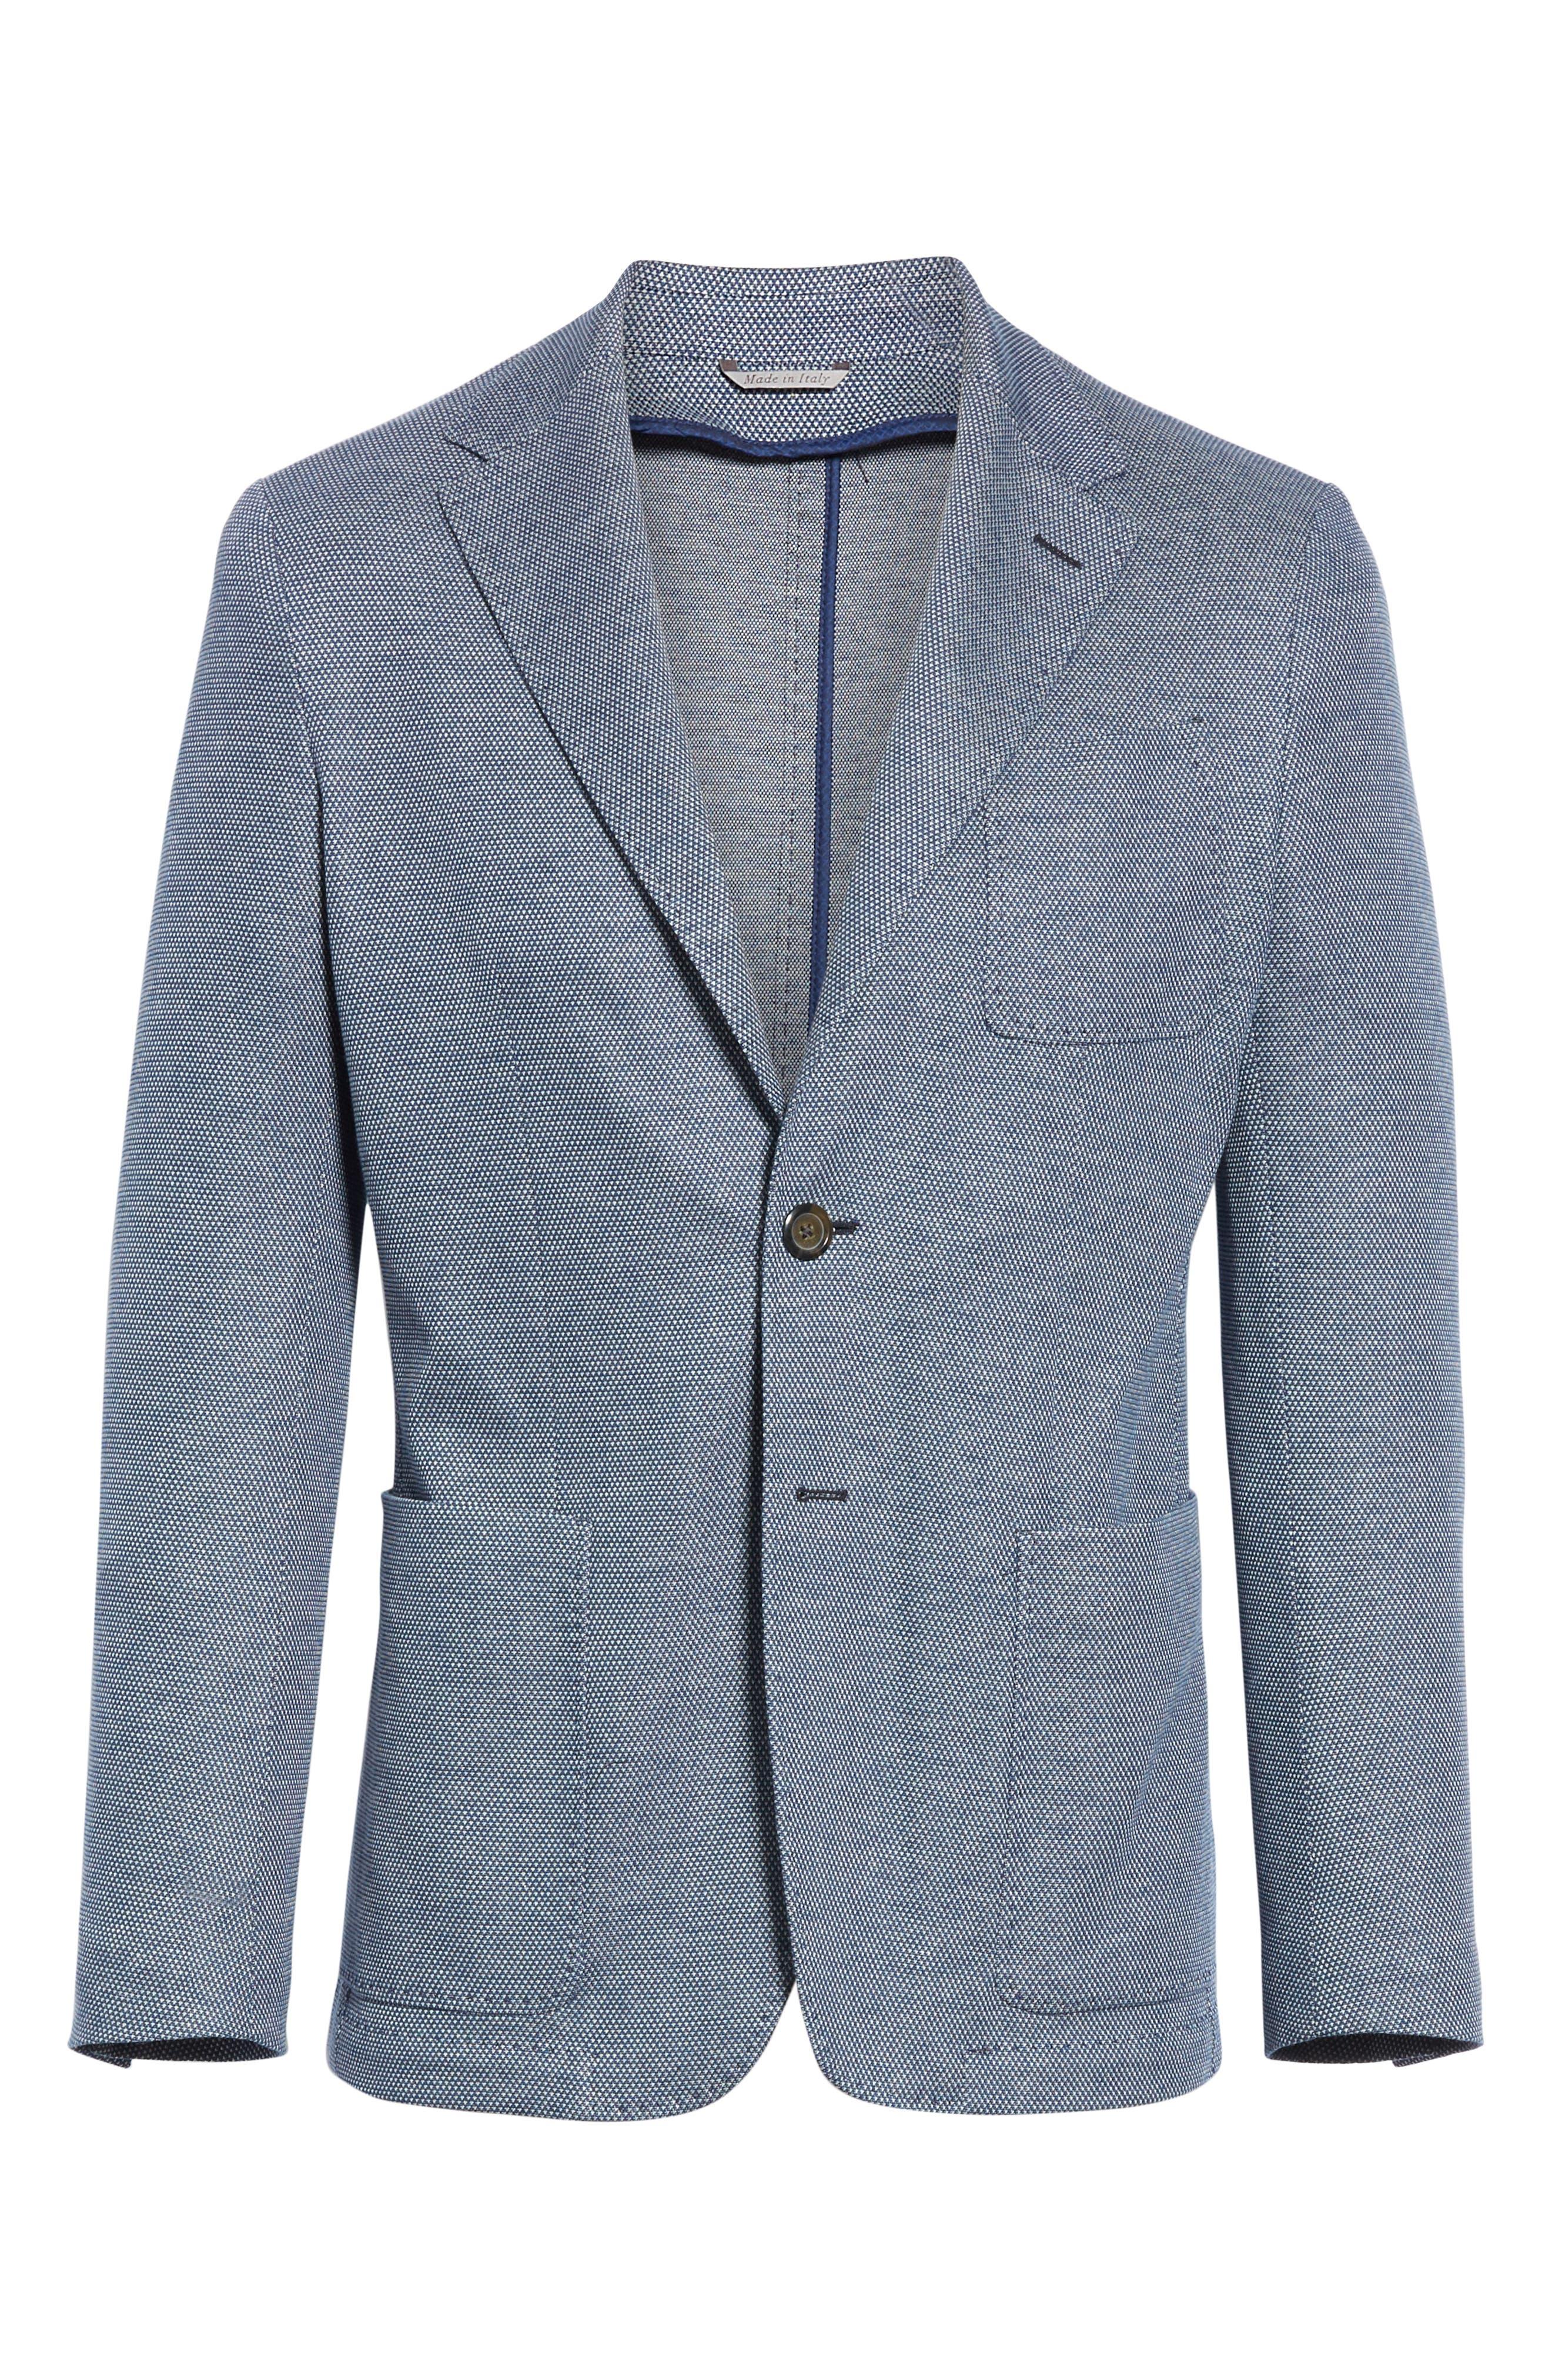 CANALI, Classic Fit Cotton Blend Sport Coat, Alternate thumbnail 5, color, NAVY